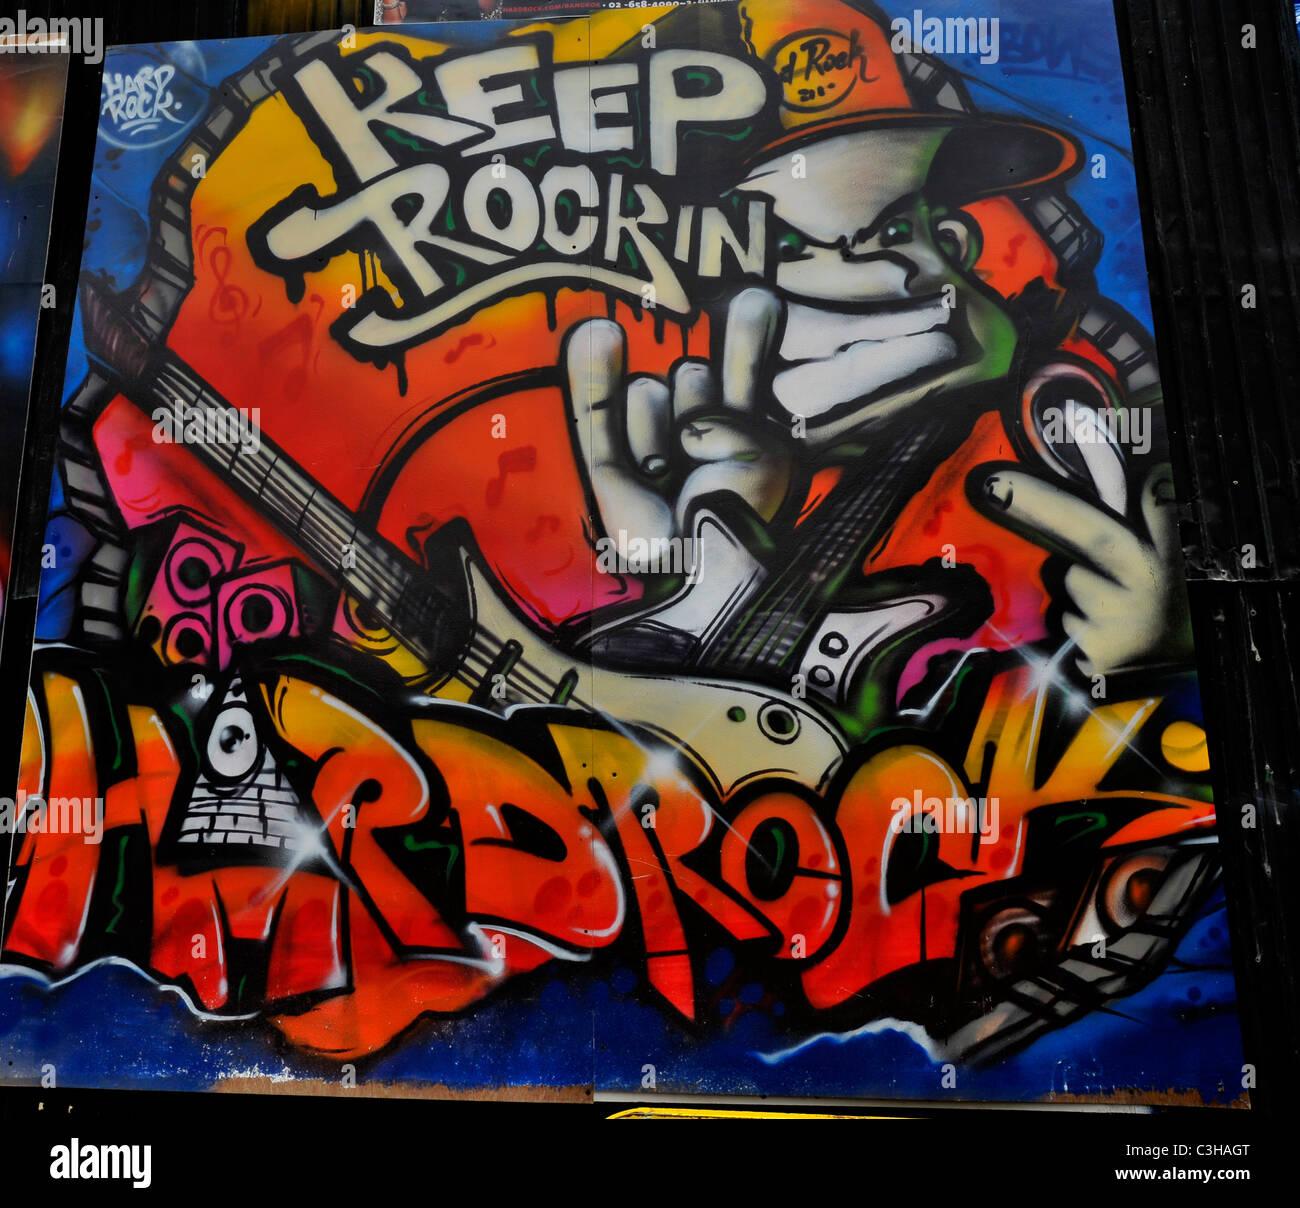 Hard rock cafe graffiti on the wall expressionism and social messaging weird and bizarre art bangkok thailand